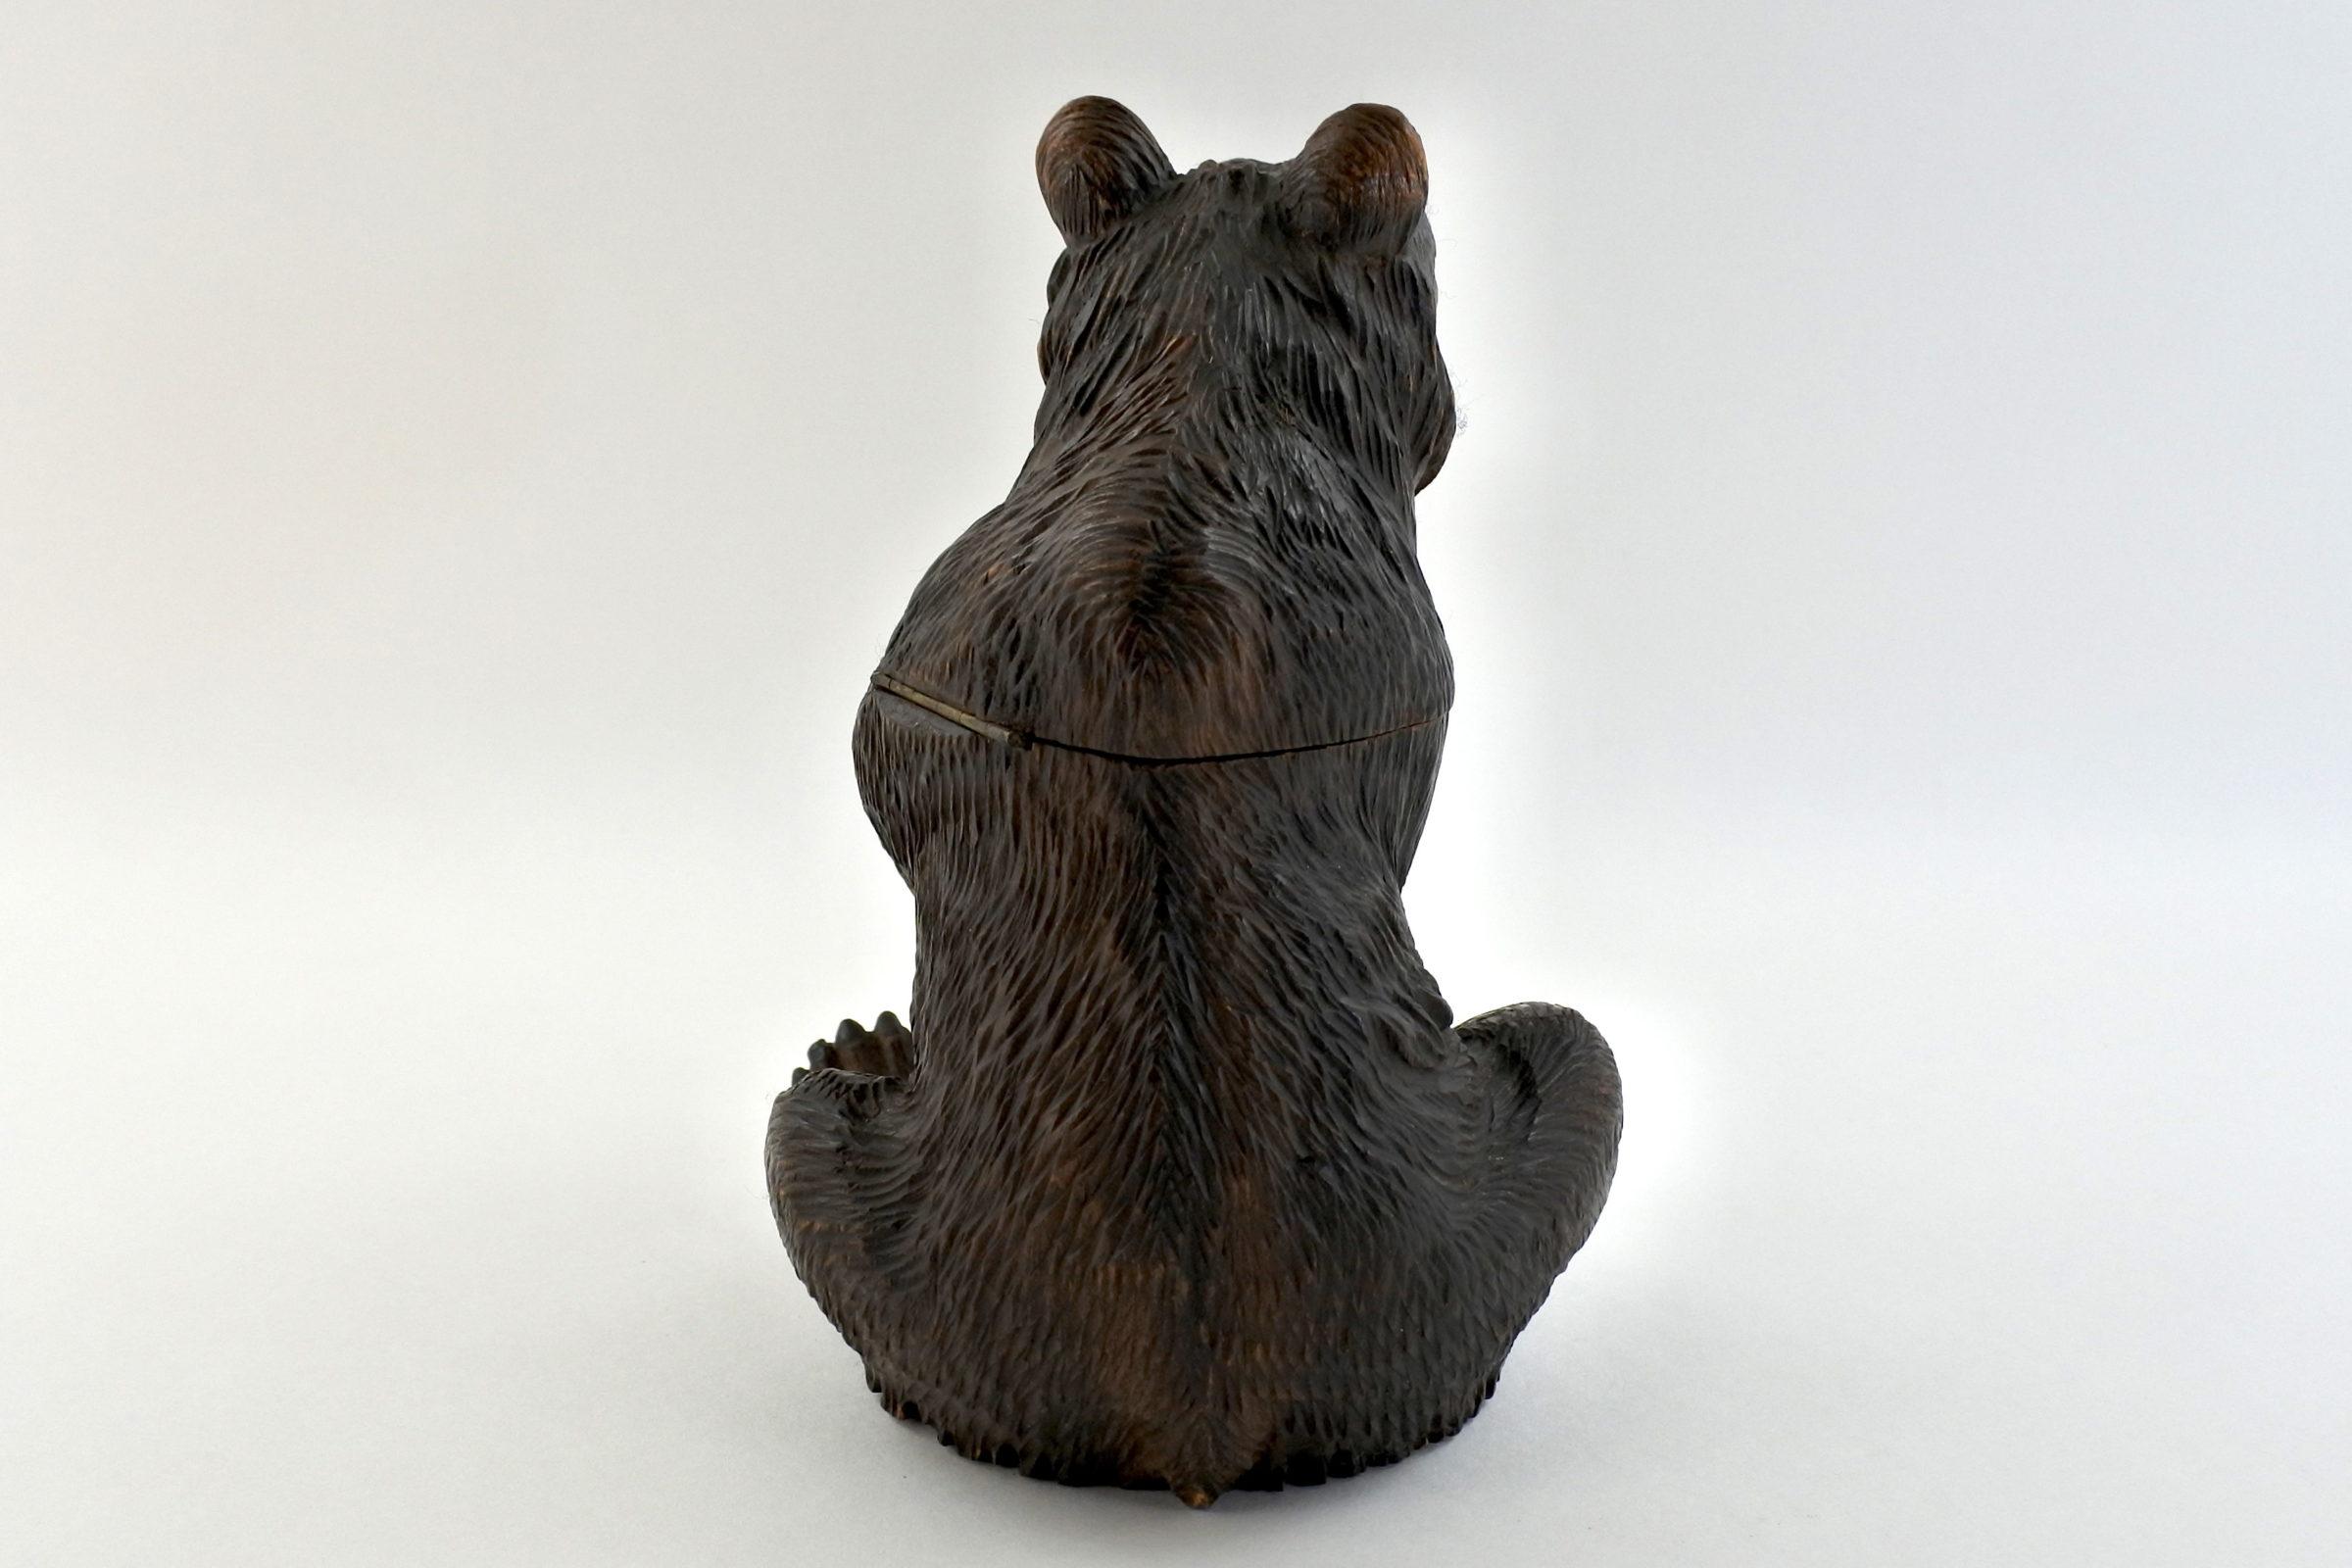 Calamaio foresta nera a forma di orso - 4